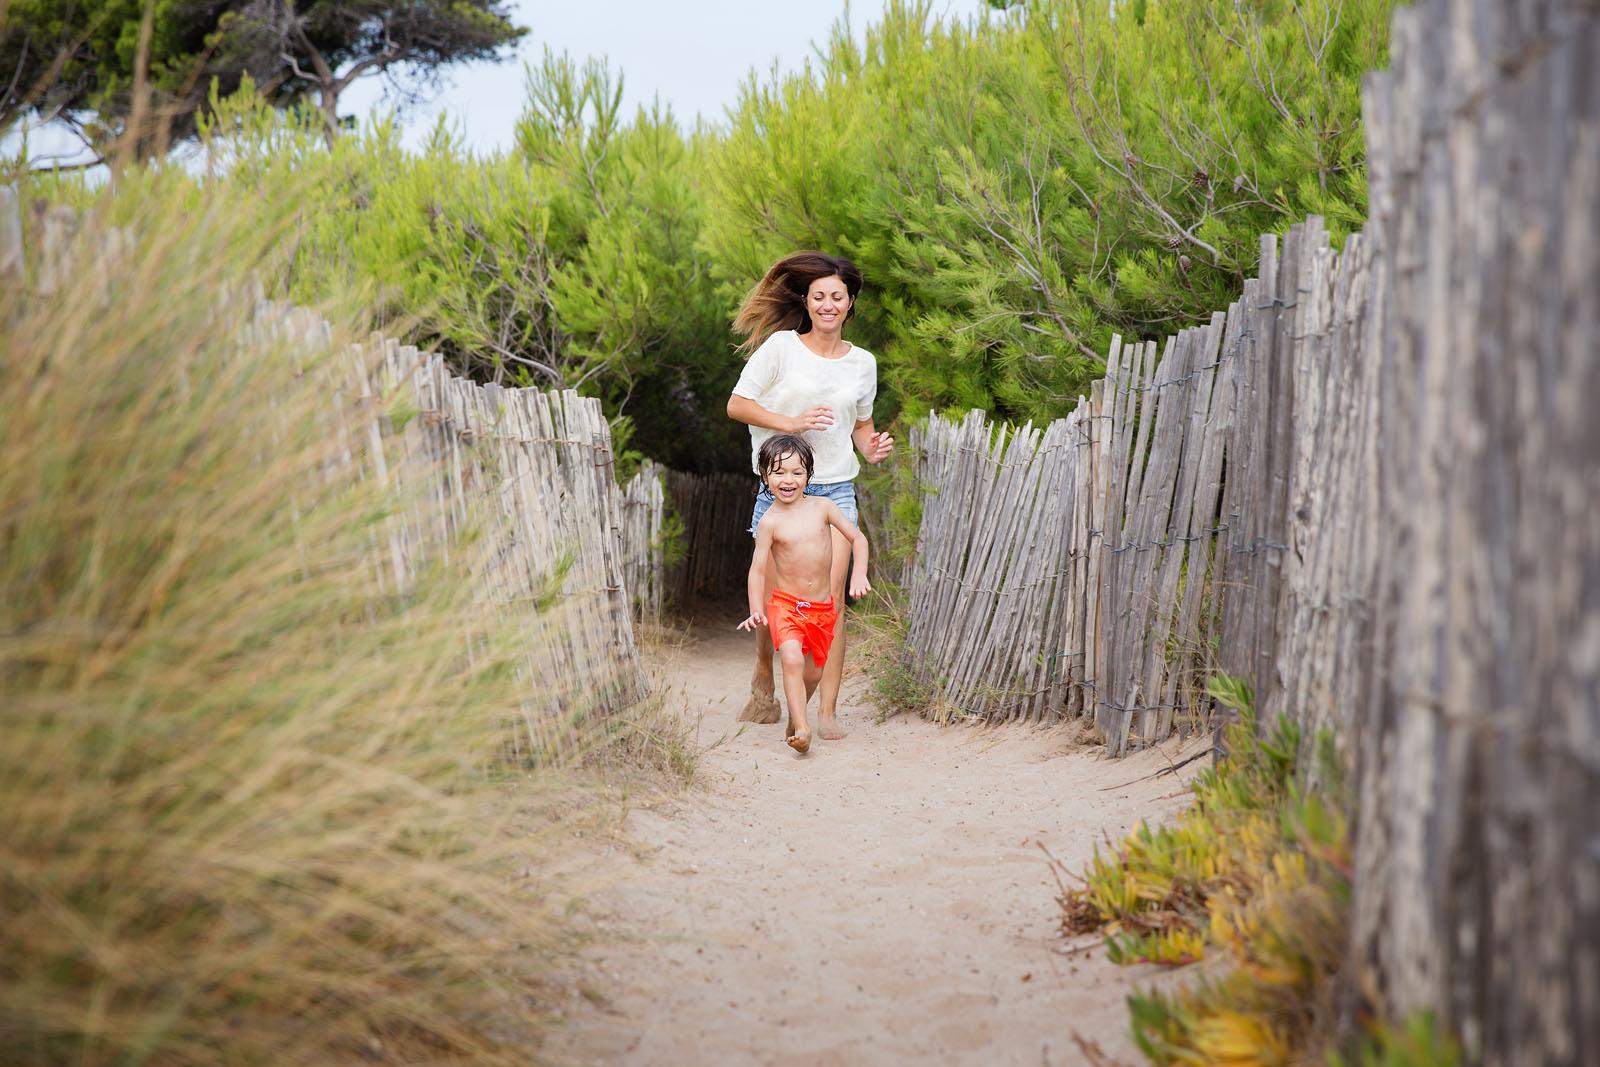 mother-and-son-running-down-beach-path-lisa-tichane